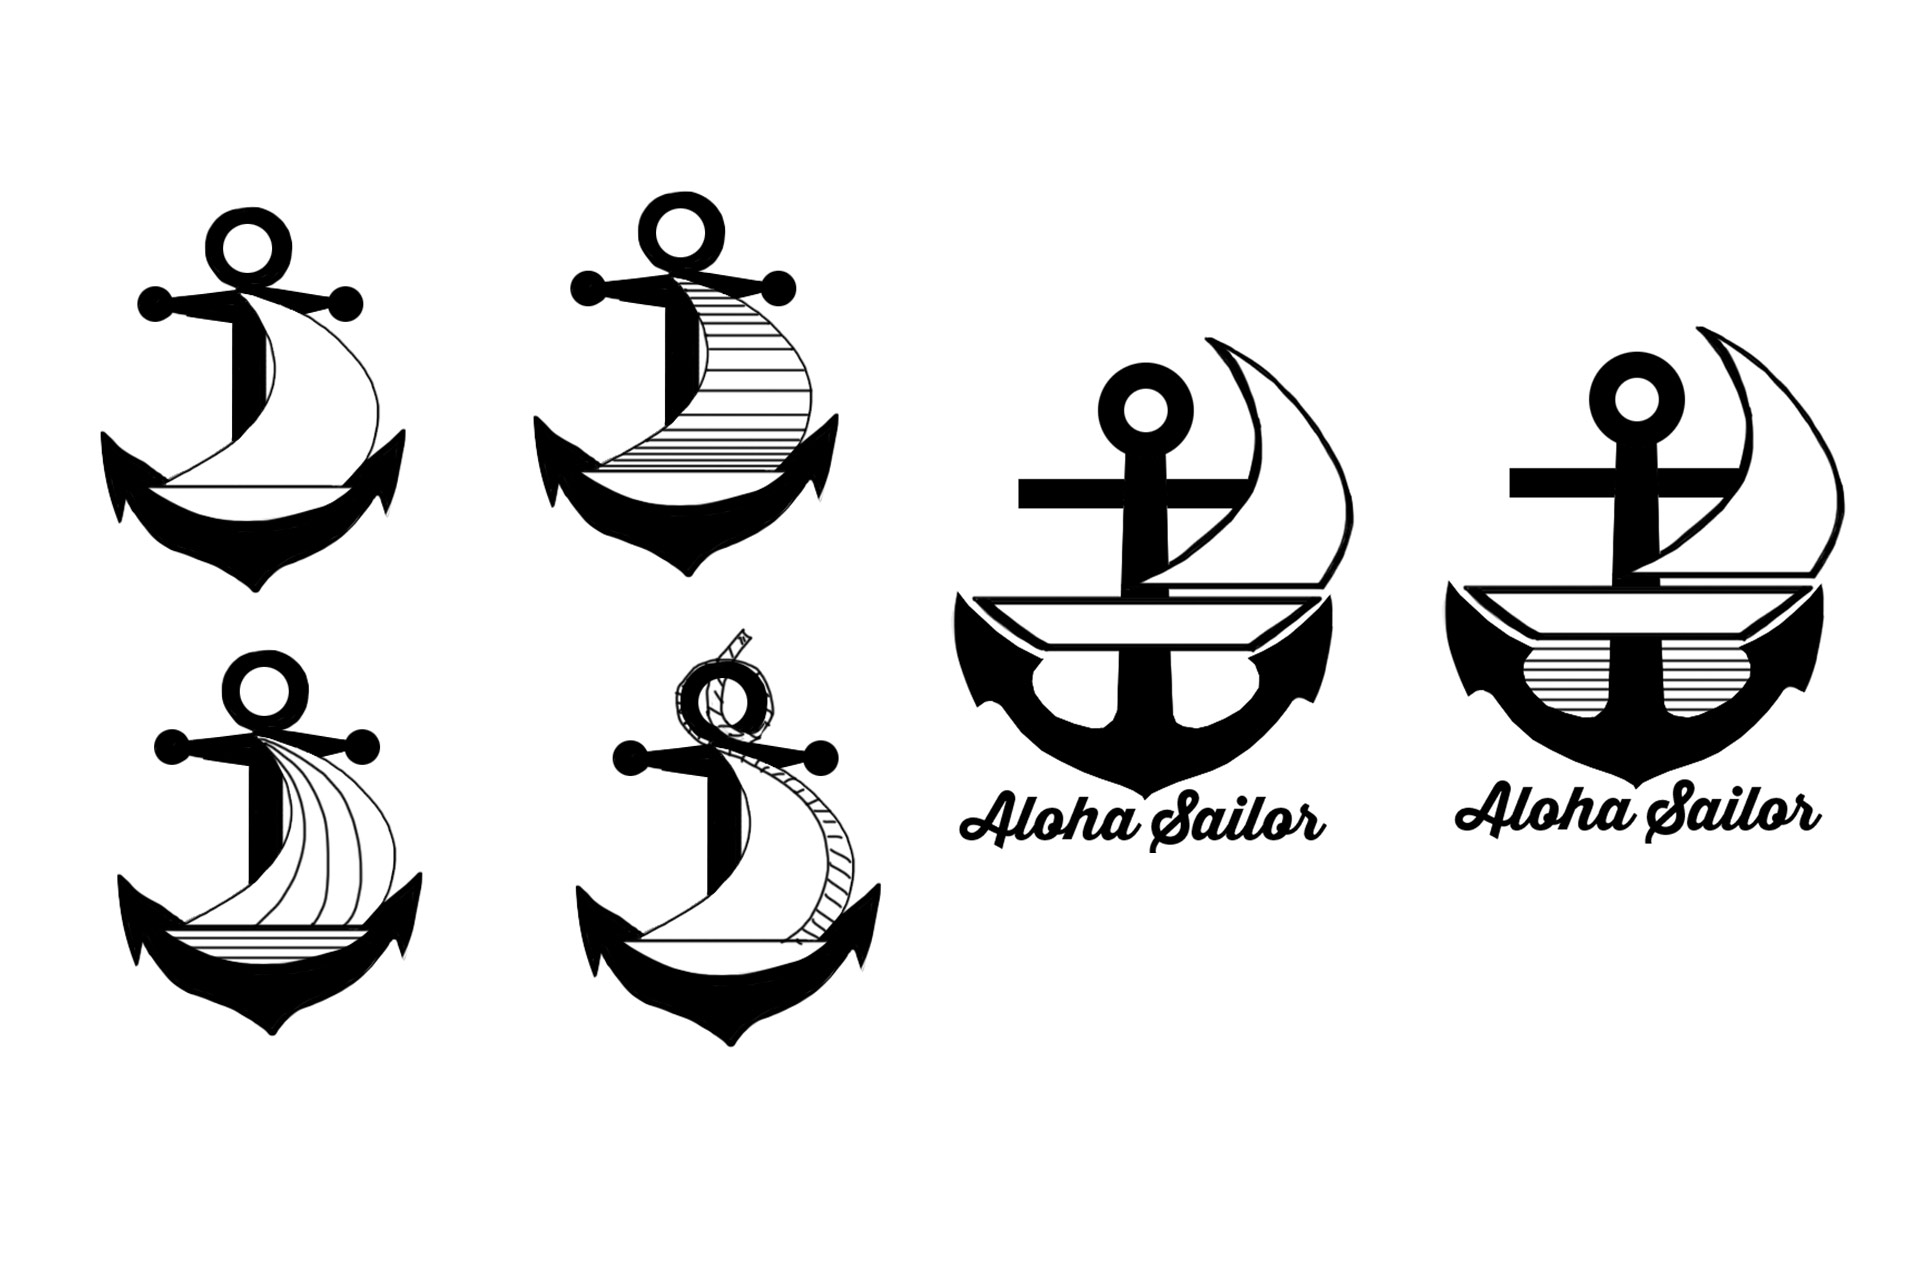 alohasailor3